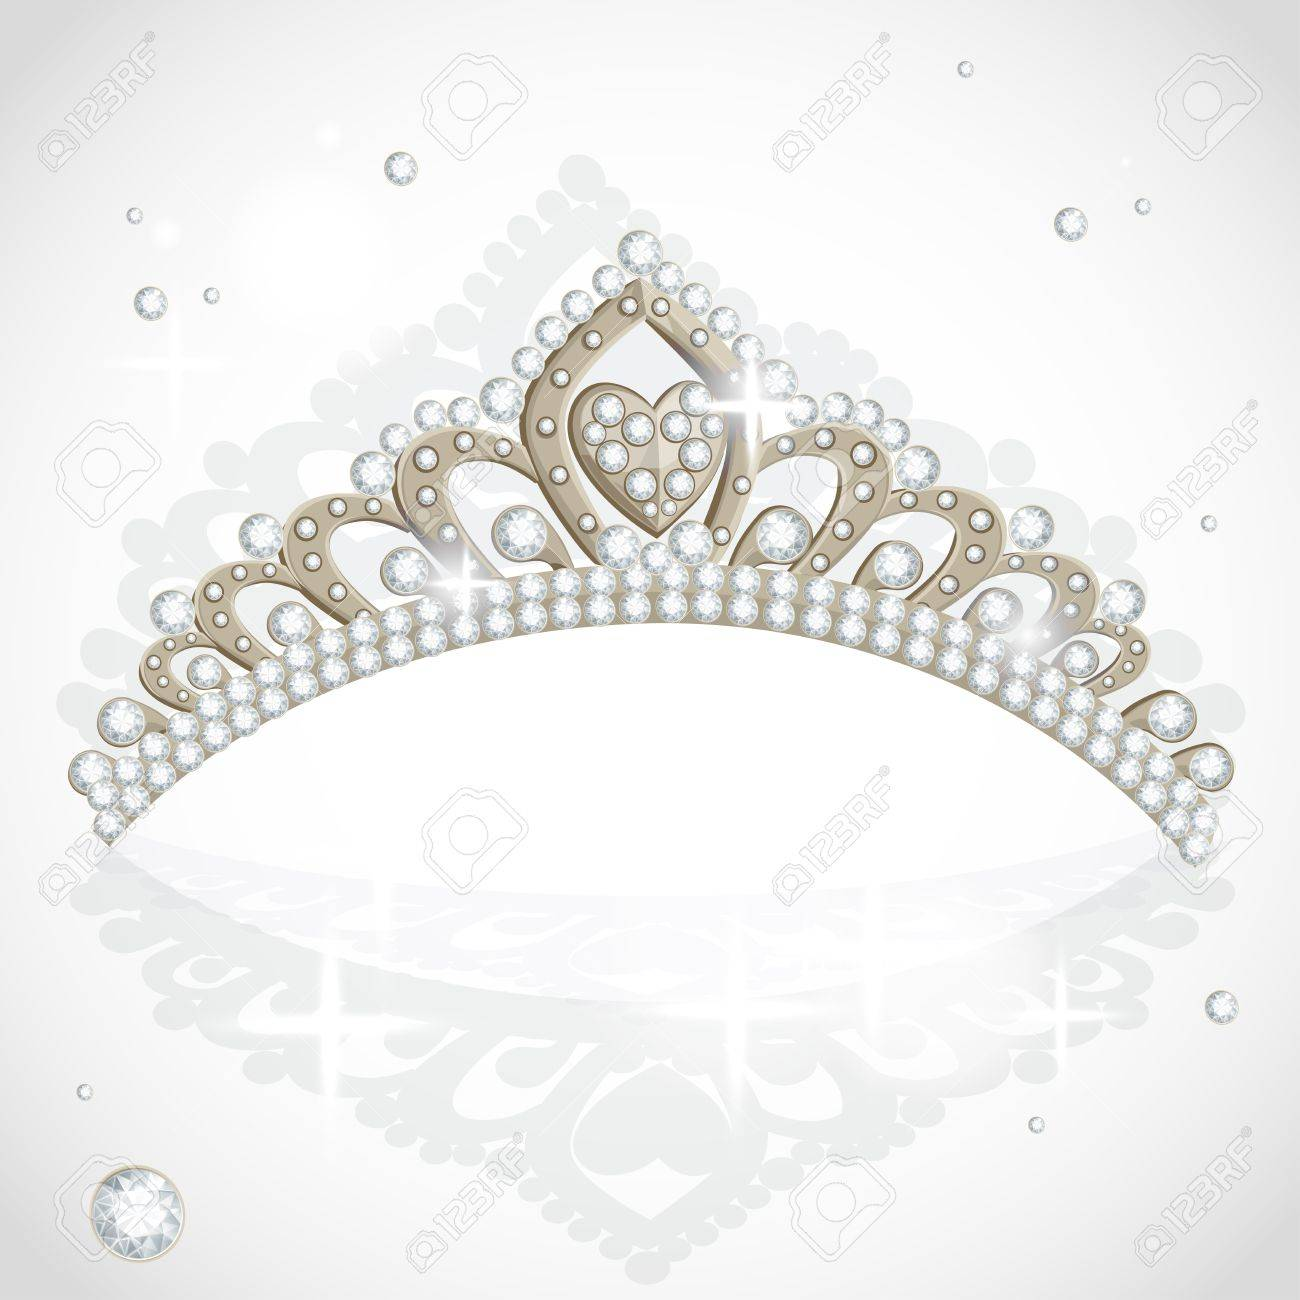 Shining tiara with diamonds Stock Vector - 15662739